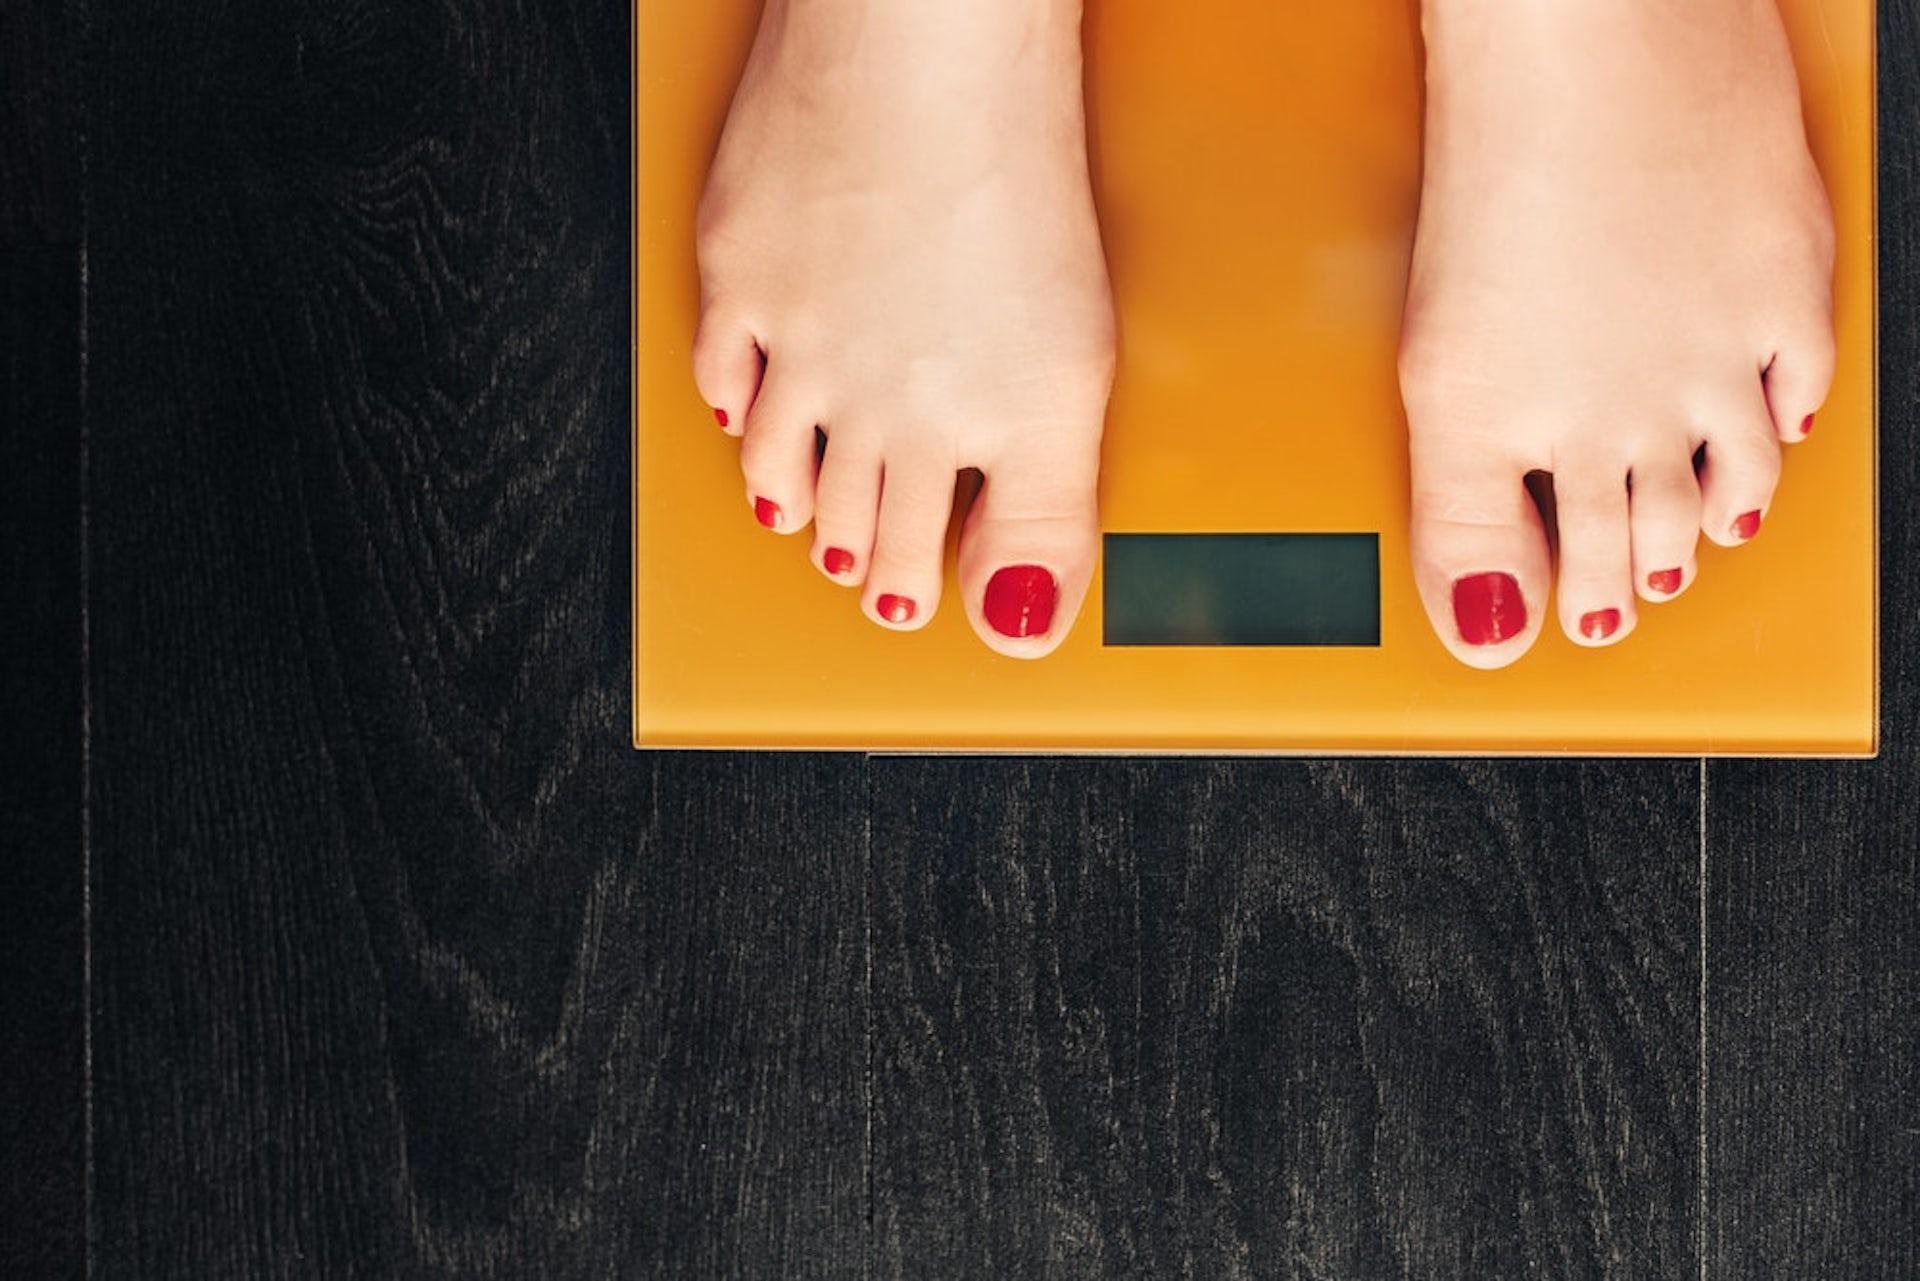 Penelitian buktikan diet kilat sangat efektif